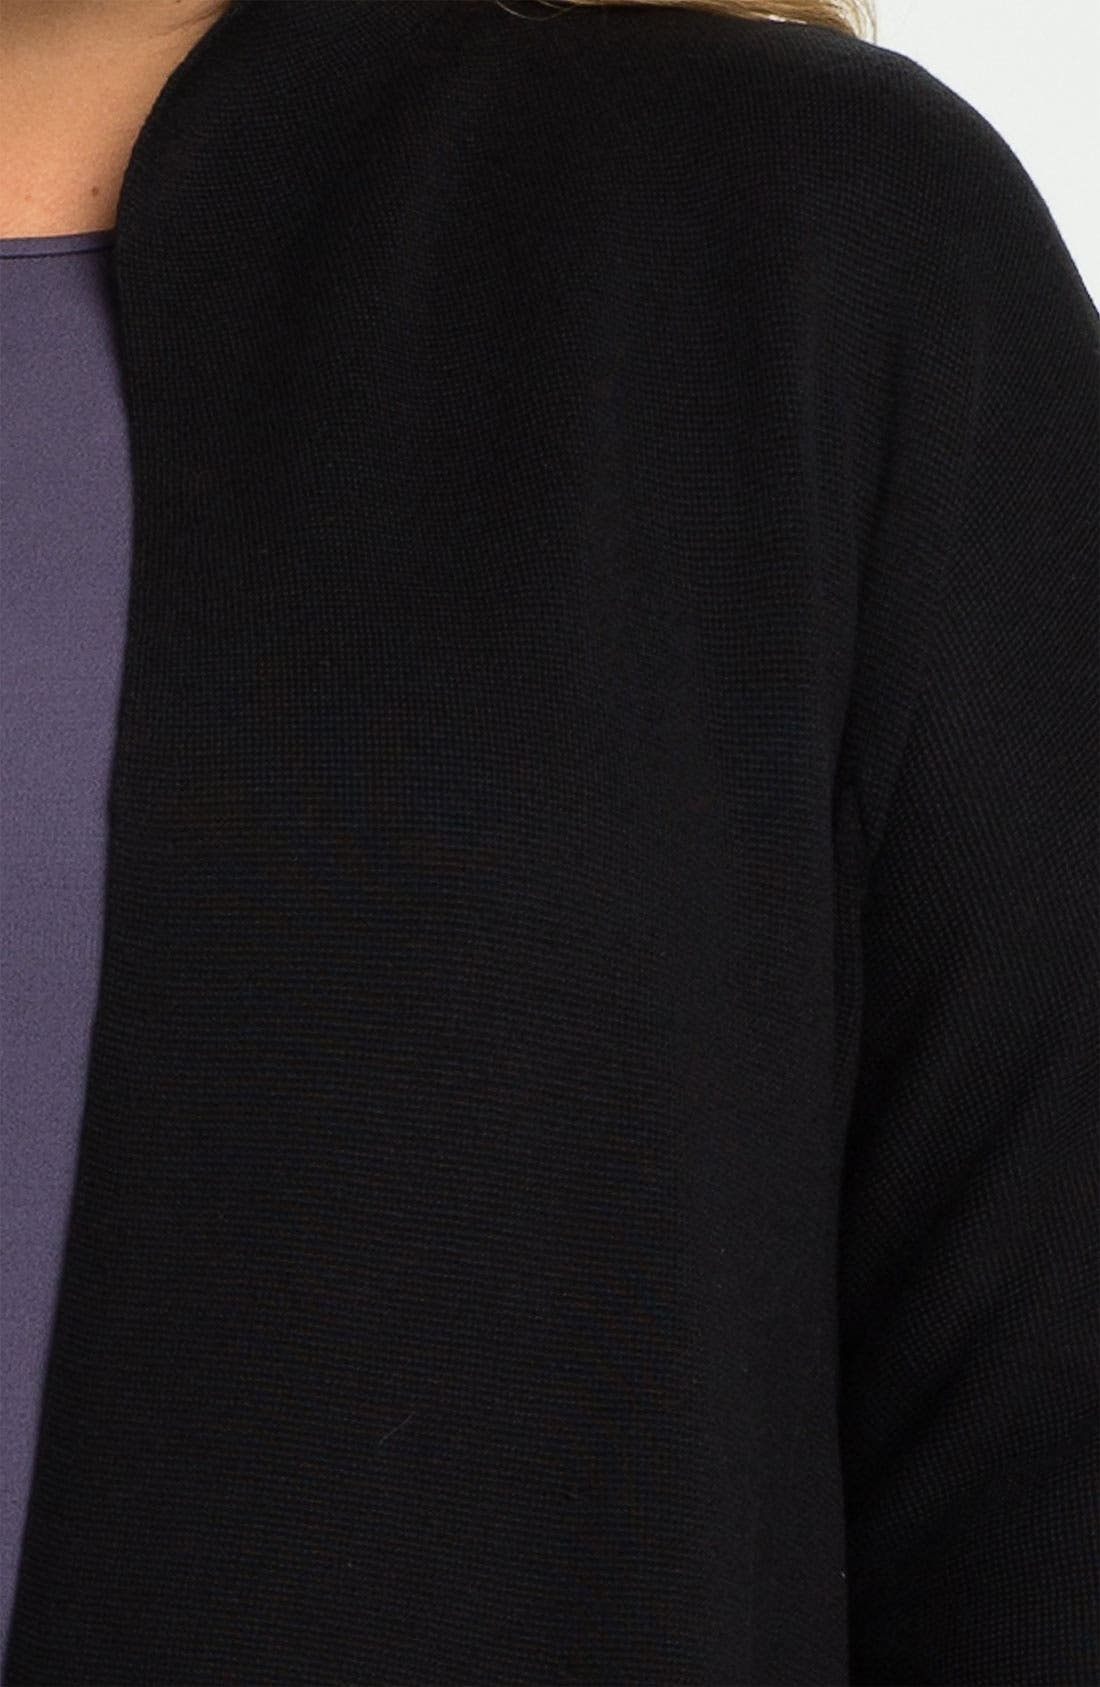 Alternate Image 3  - Eileen Fisher Silk Blend Knit Jacket (Plus)